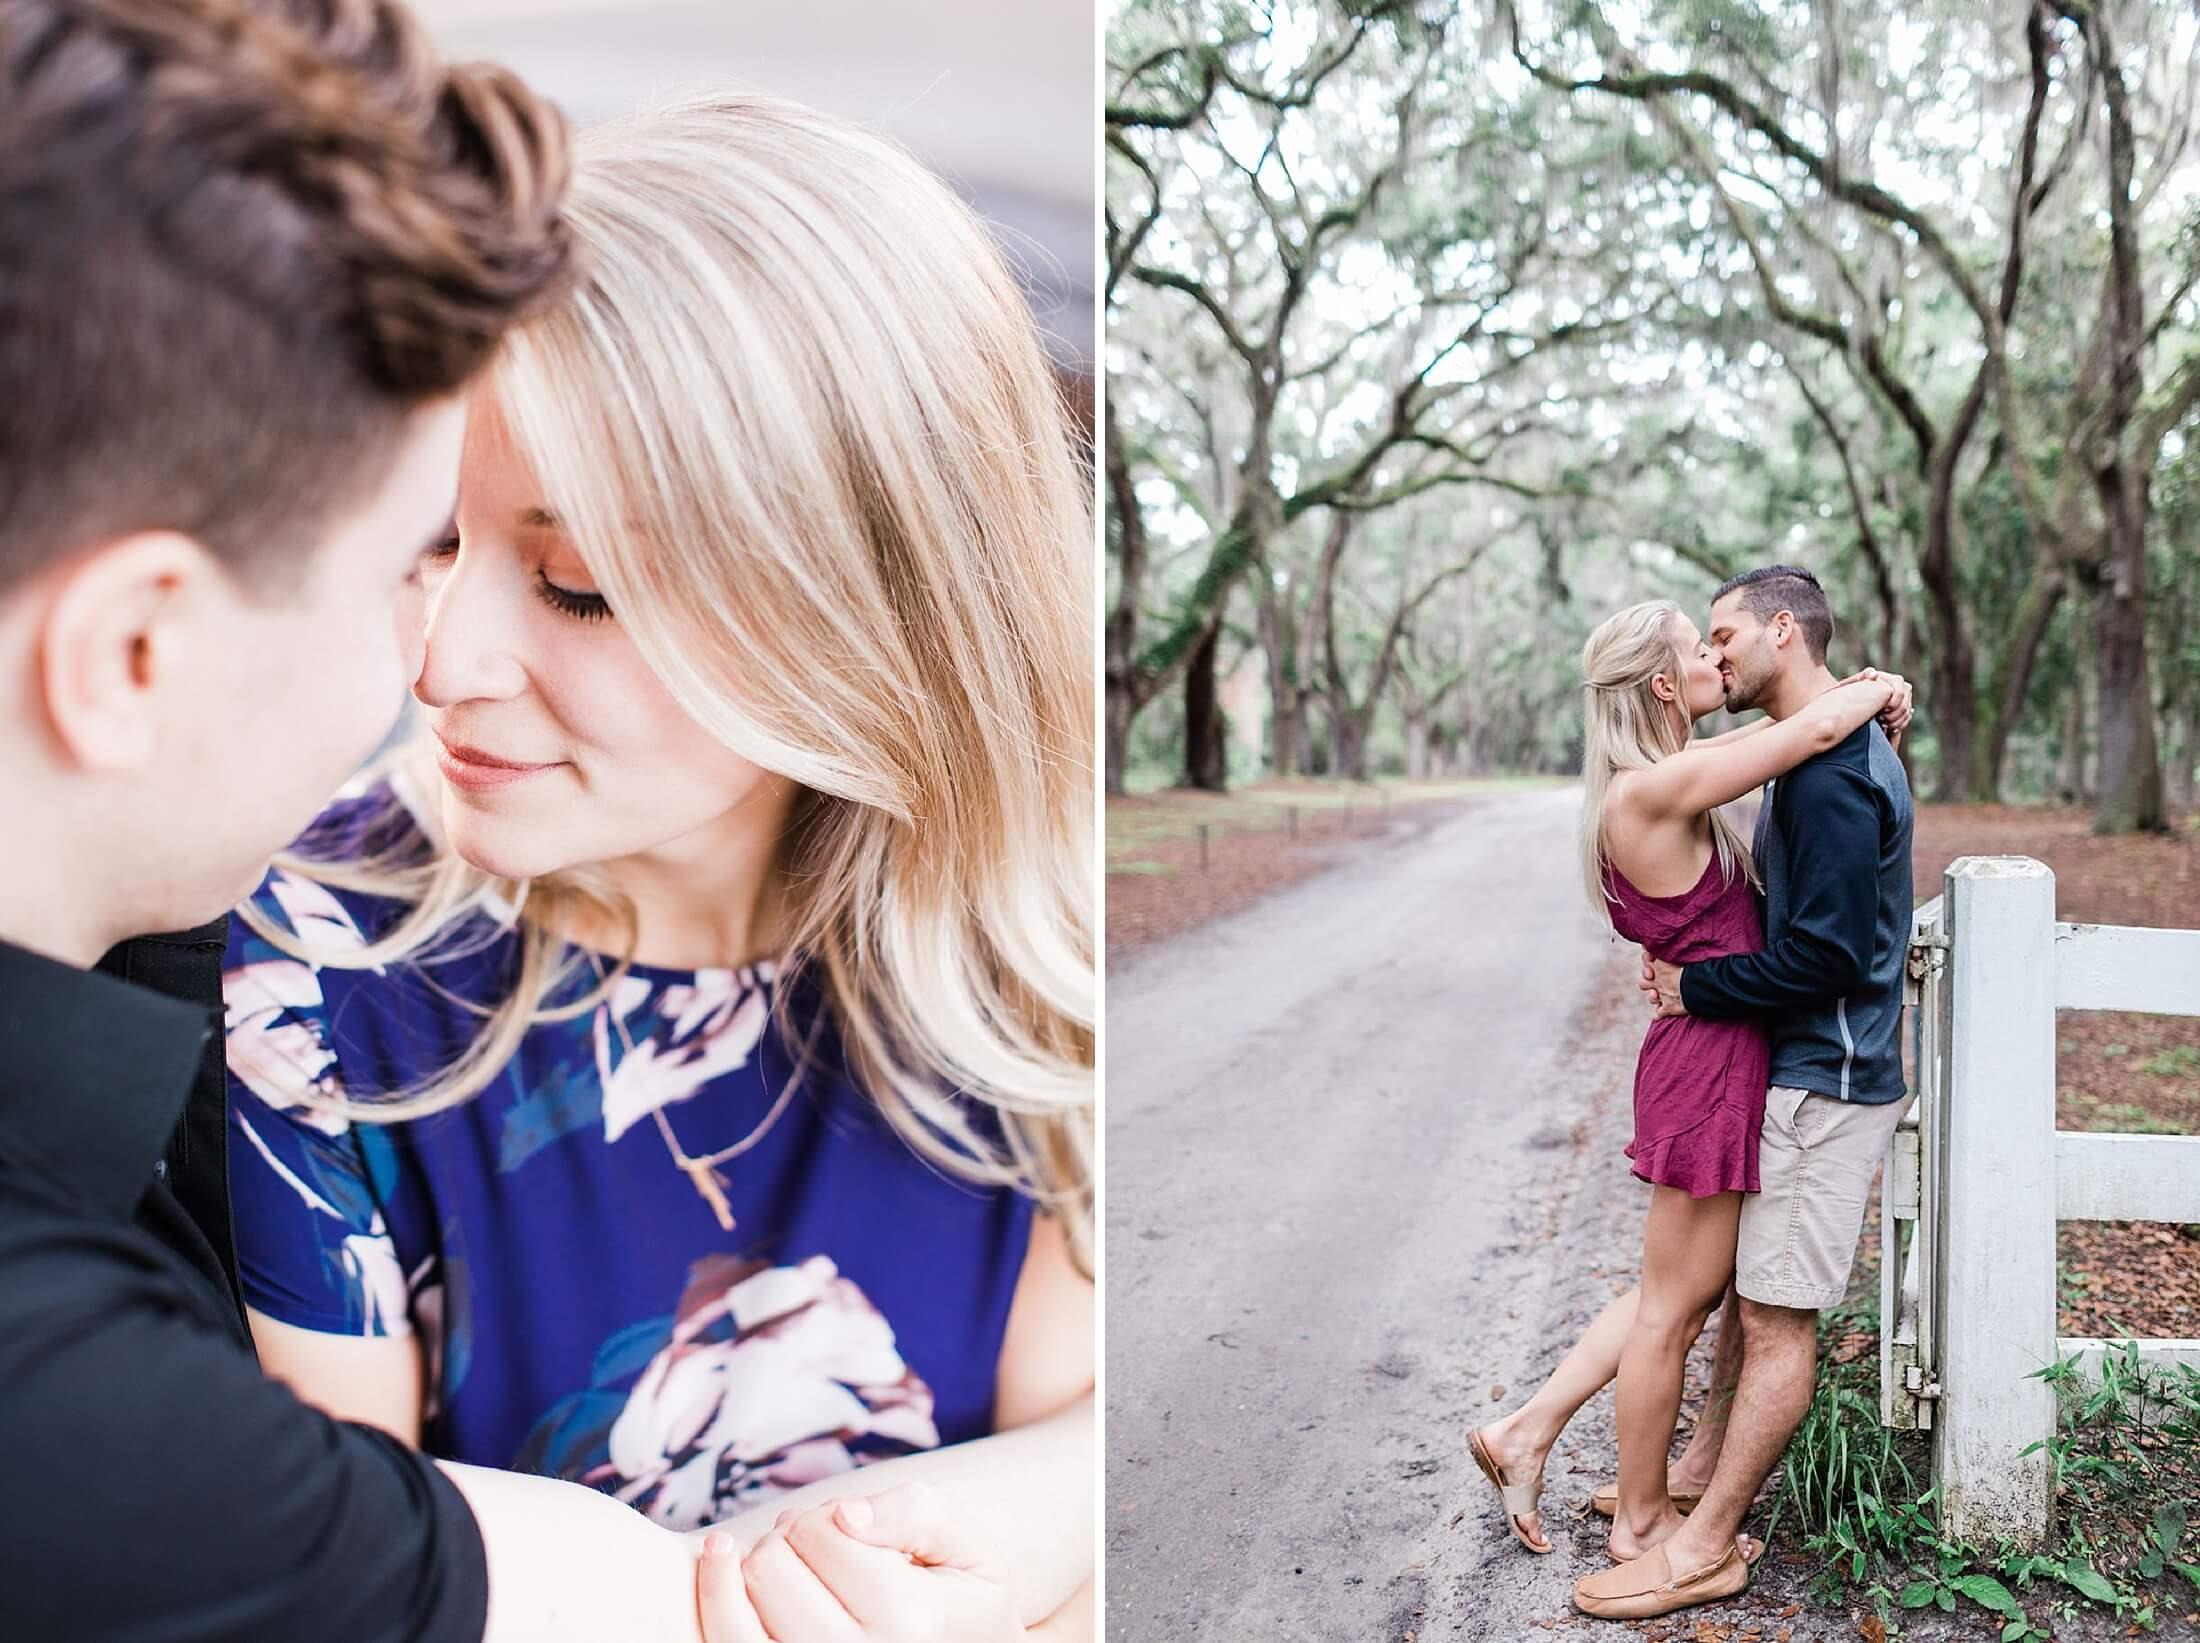 Apt-b-photography-savannah-engagement-photographer-savannah-wedding-hilton-head-elopement-savannah-wedding-photographer-12.jpg